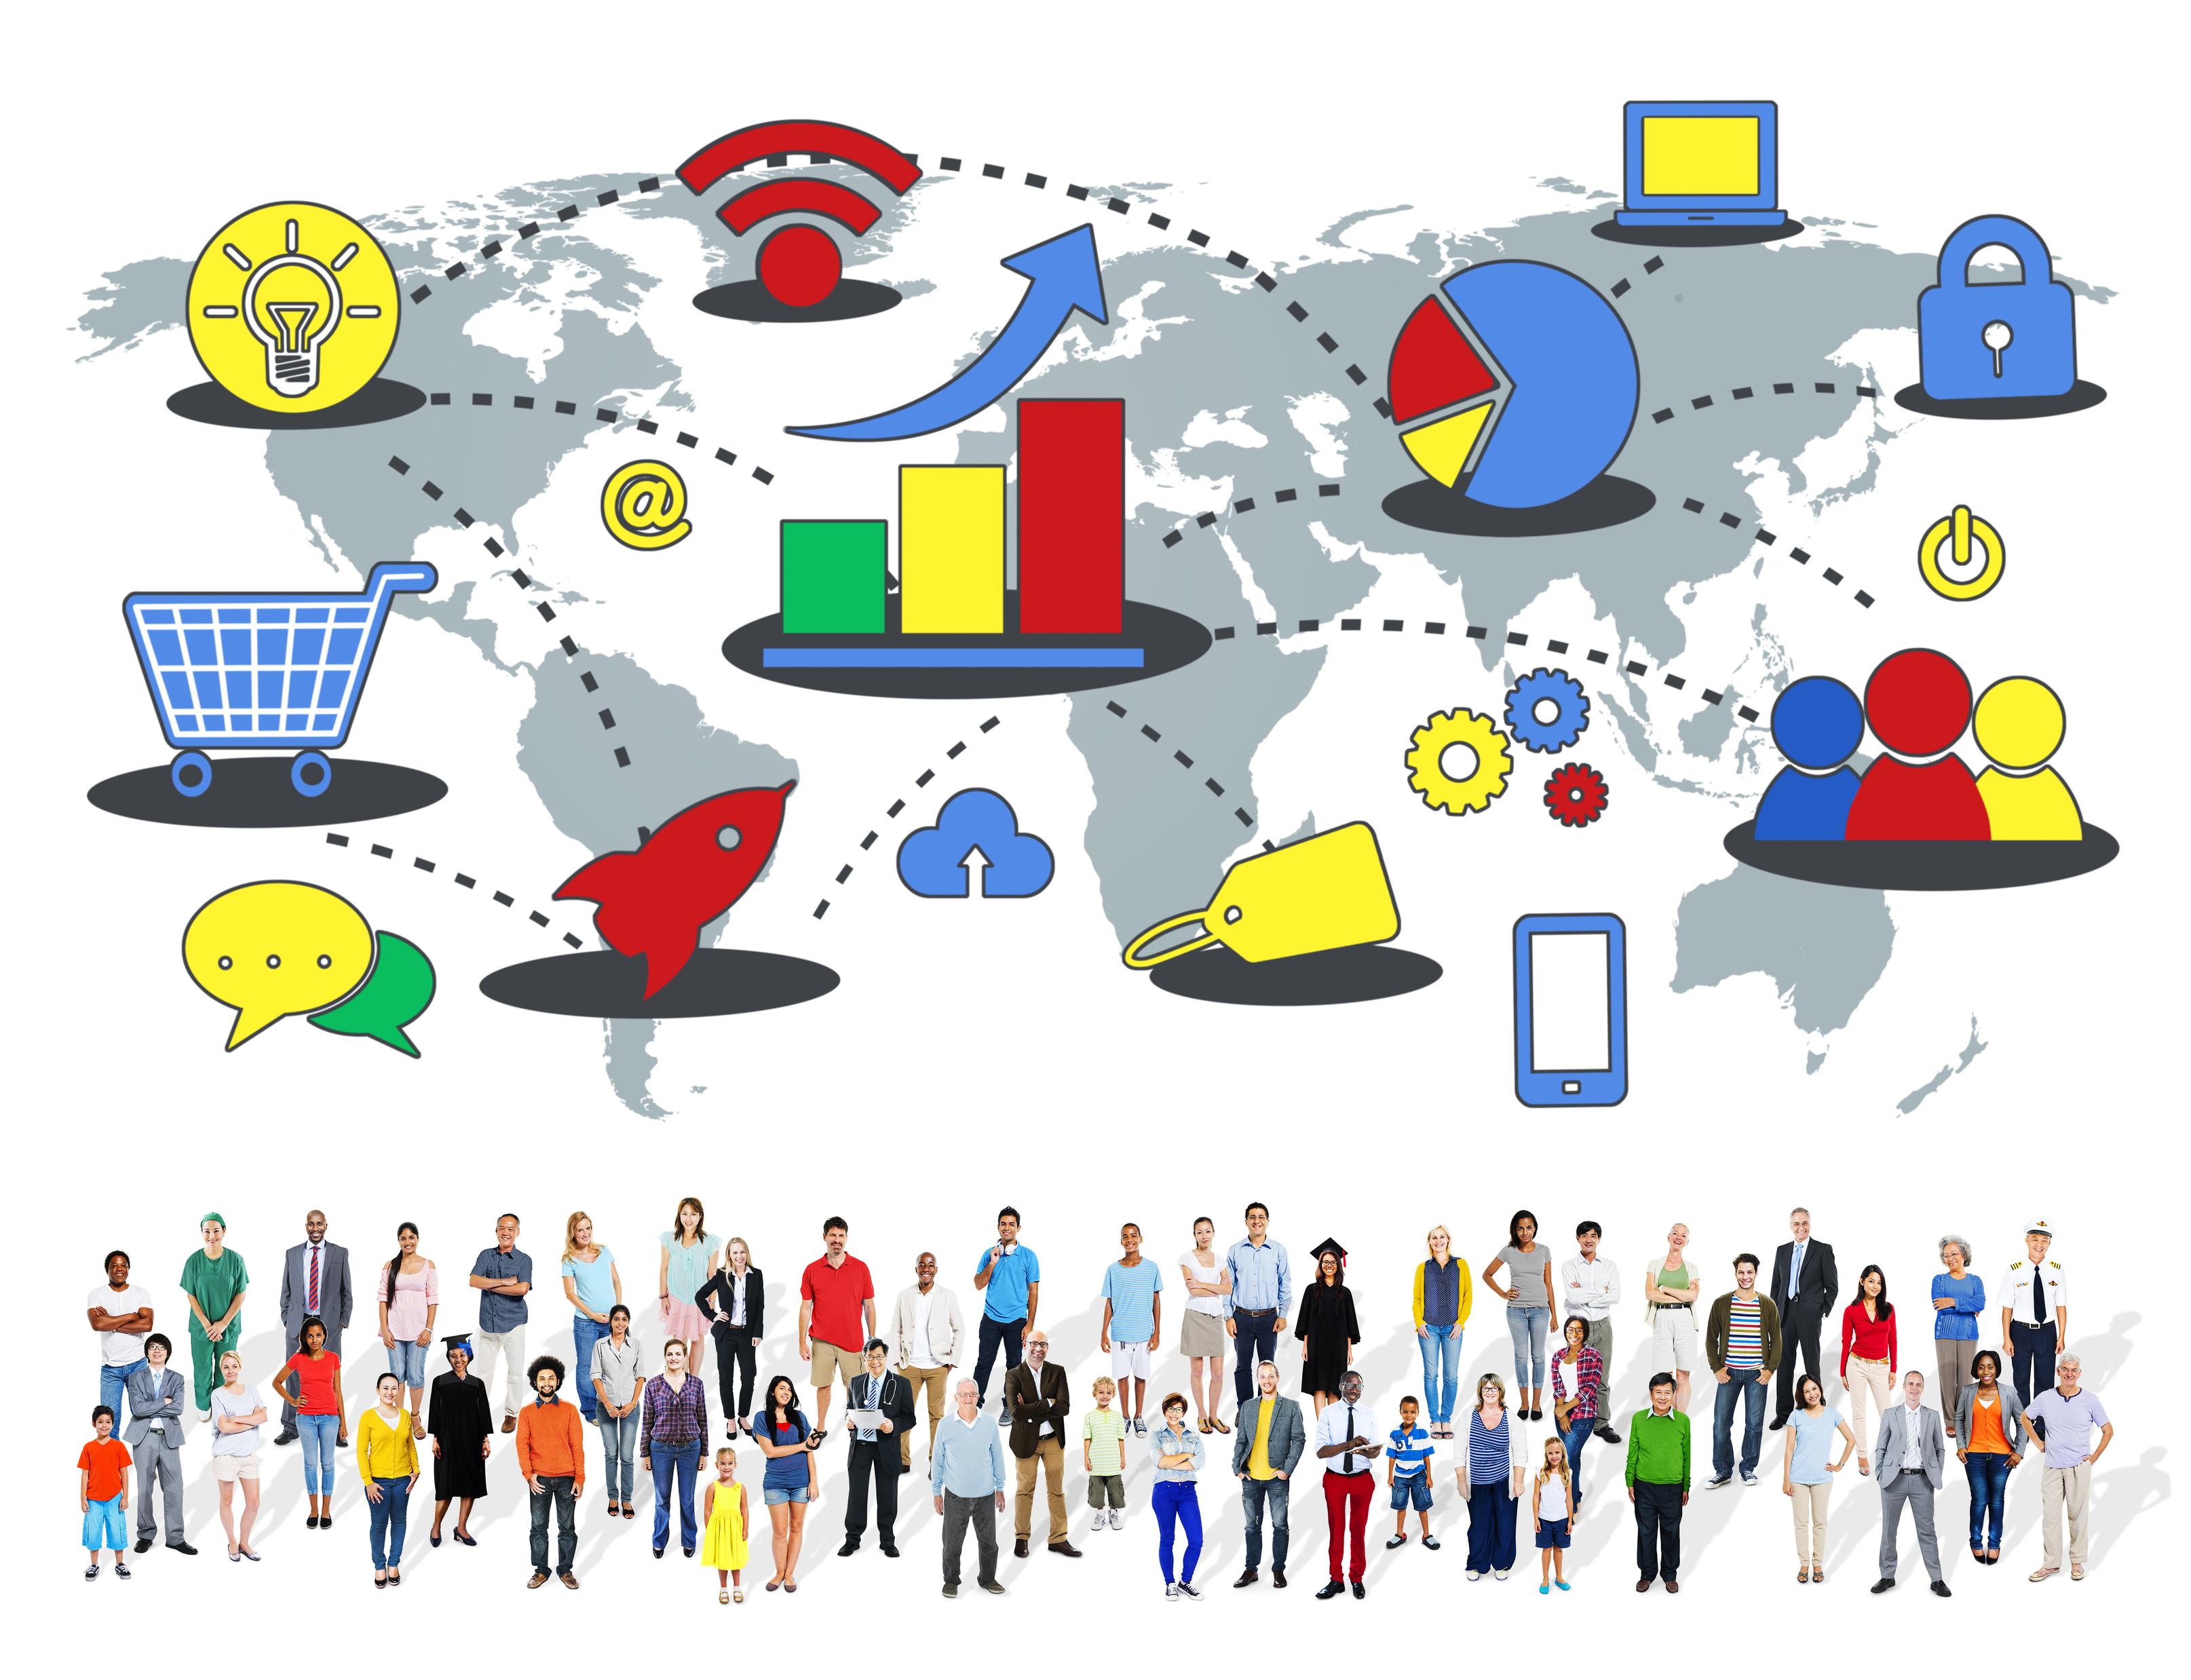 Alert Online & Social Networking